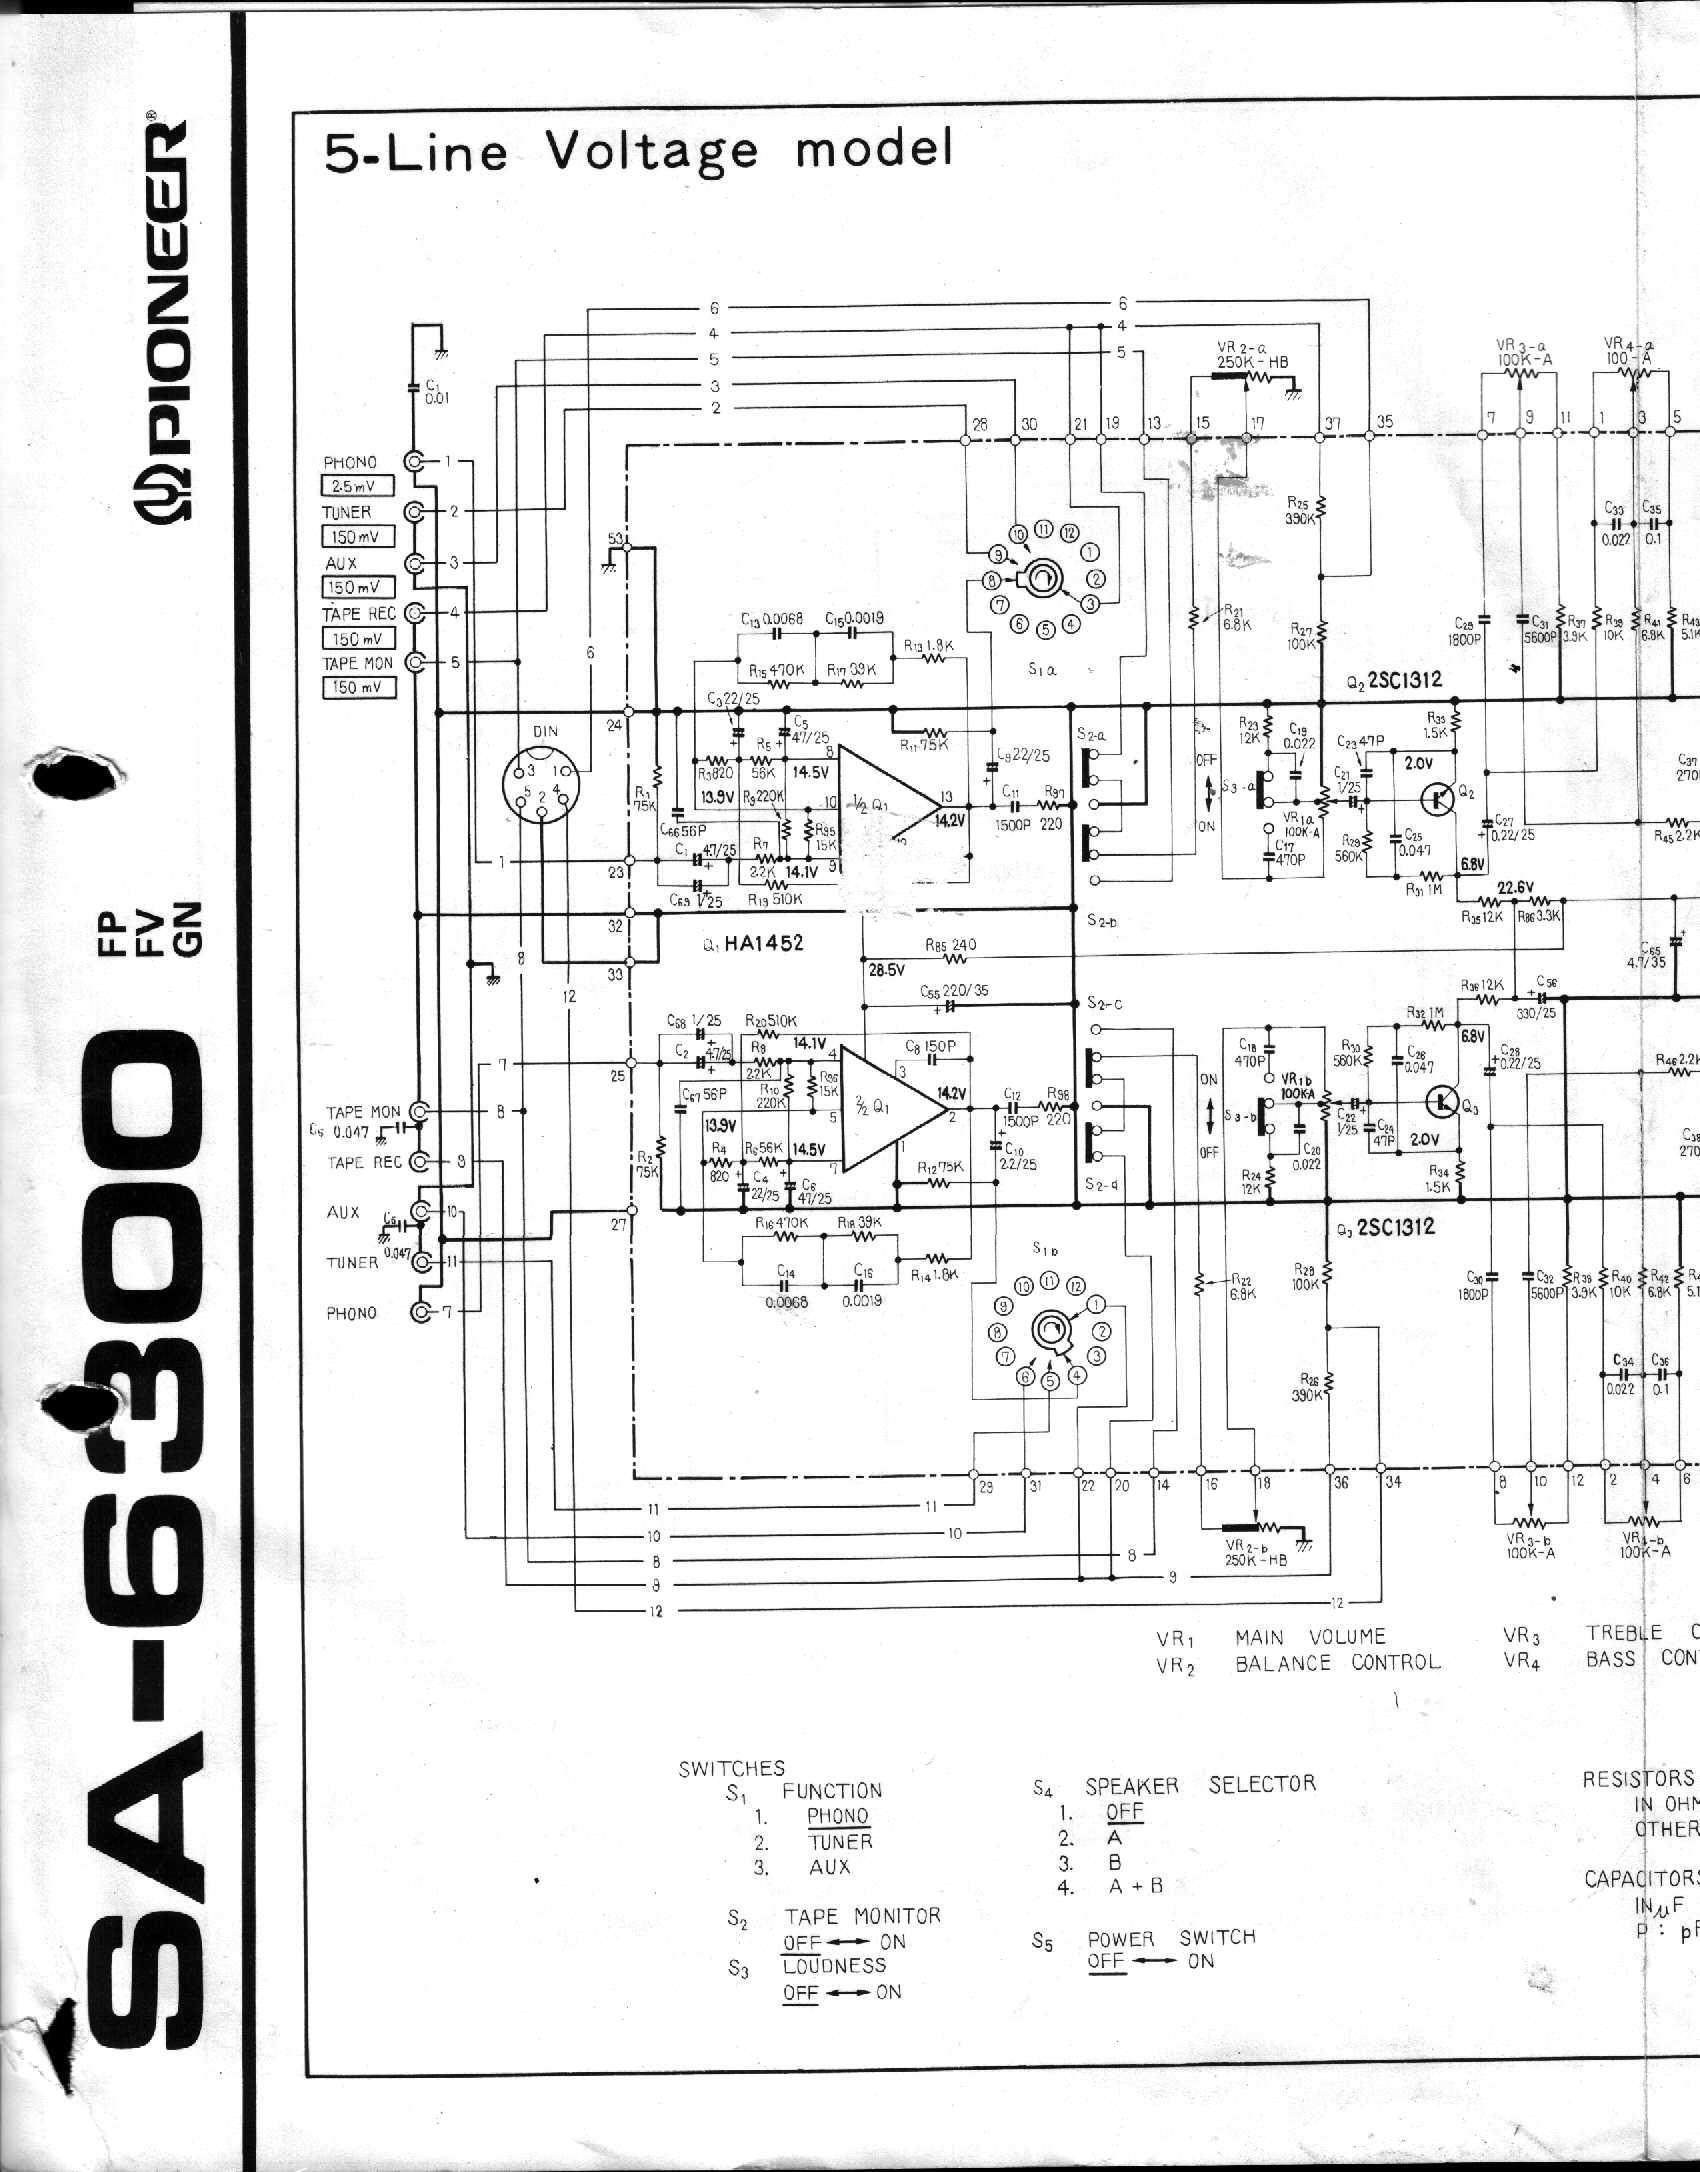 6300 Magnetek Wiring Diagram